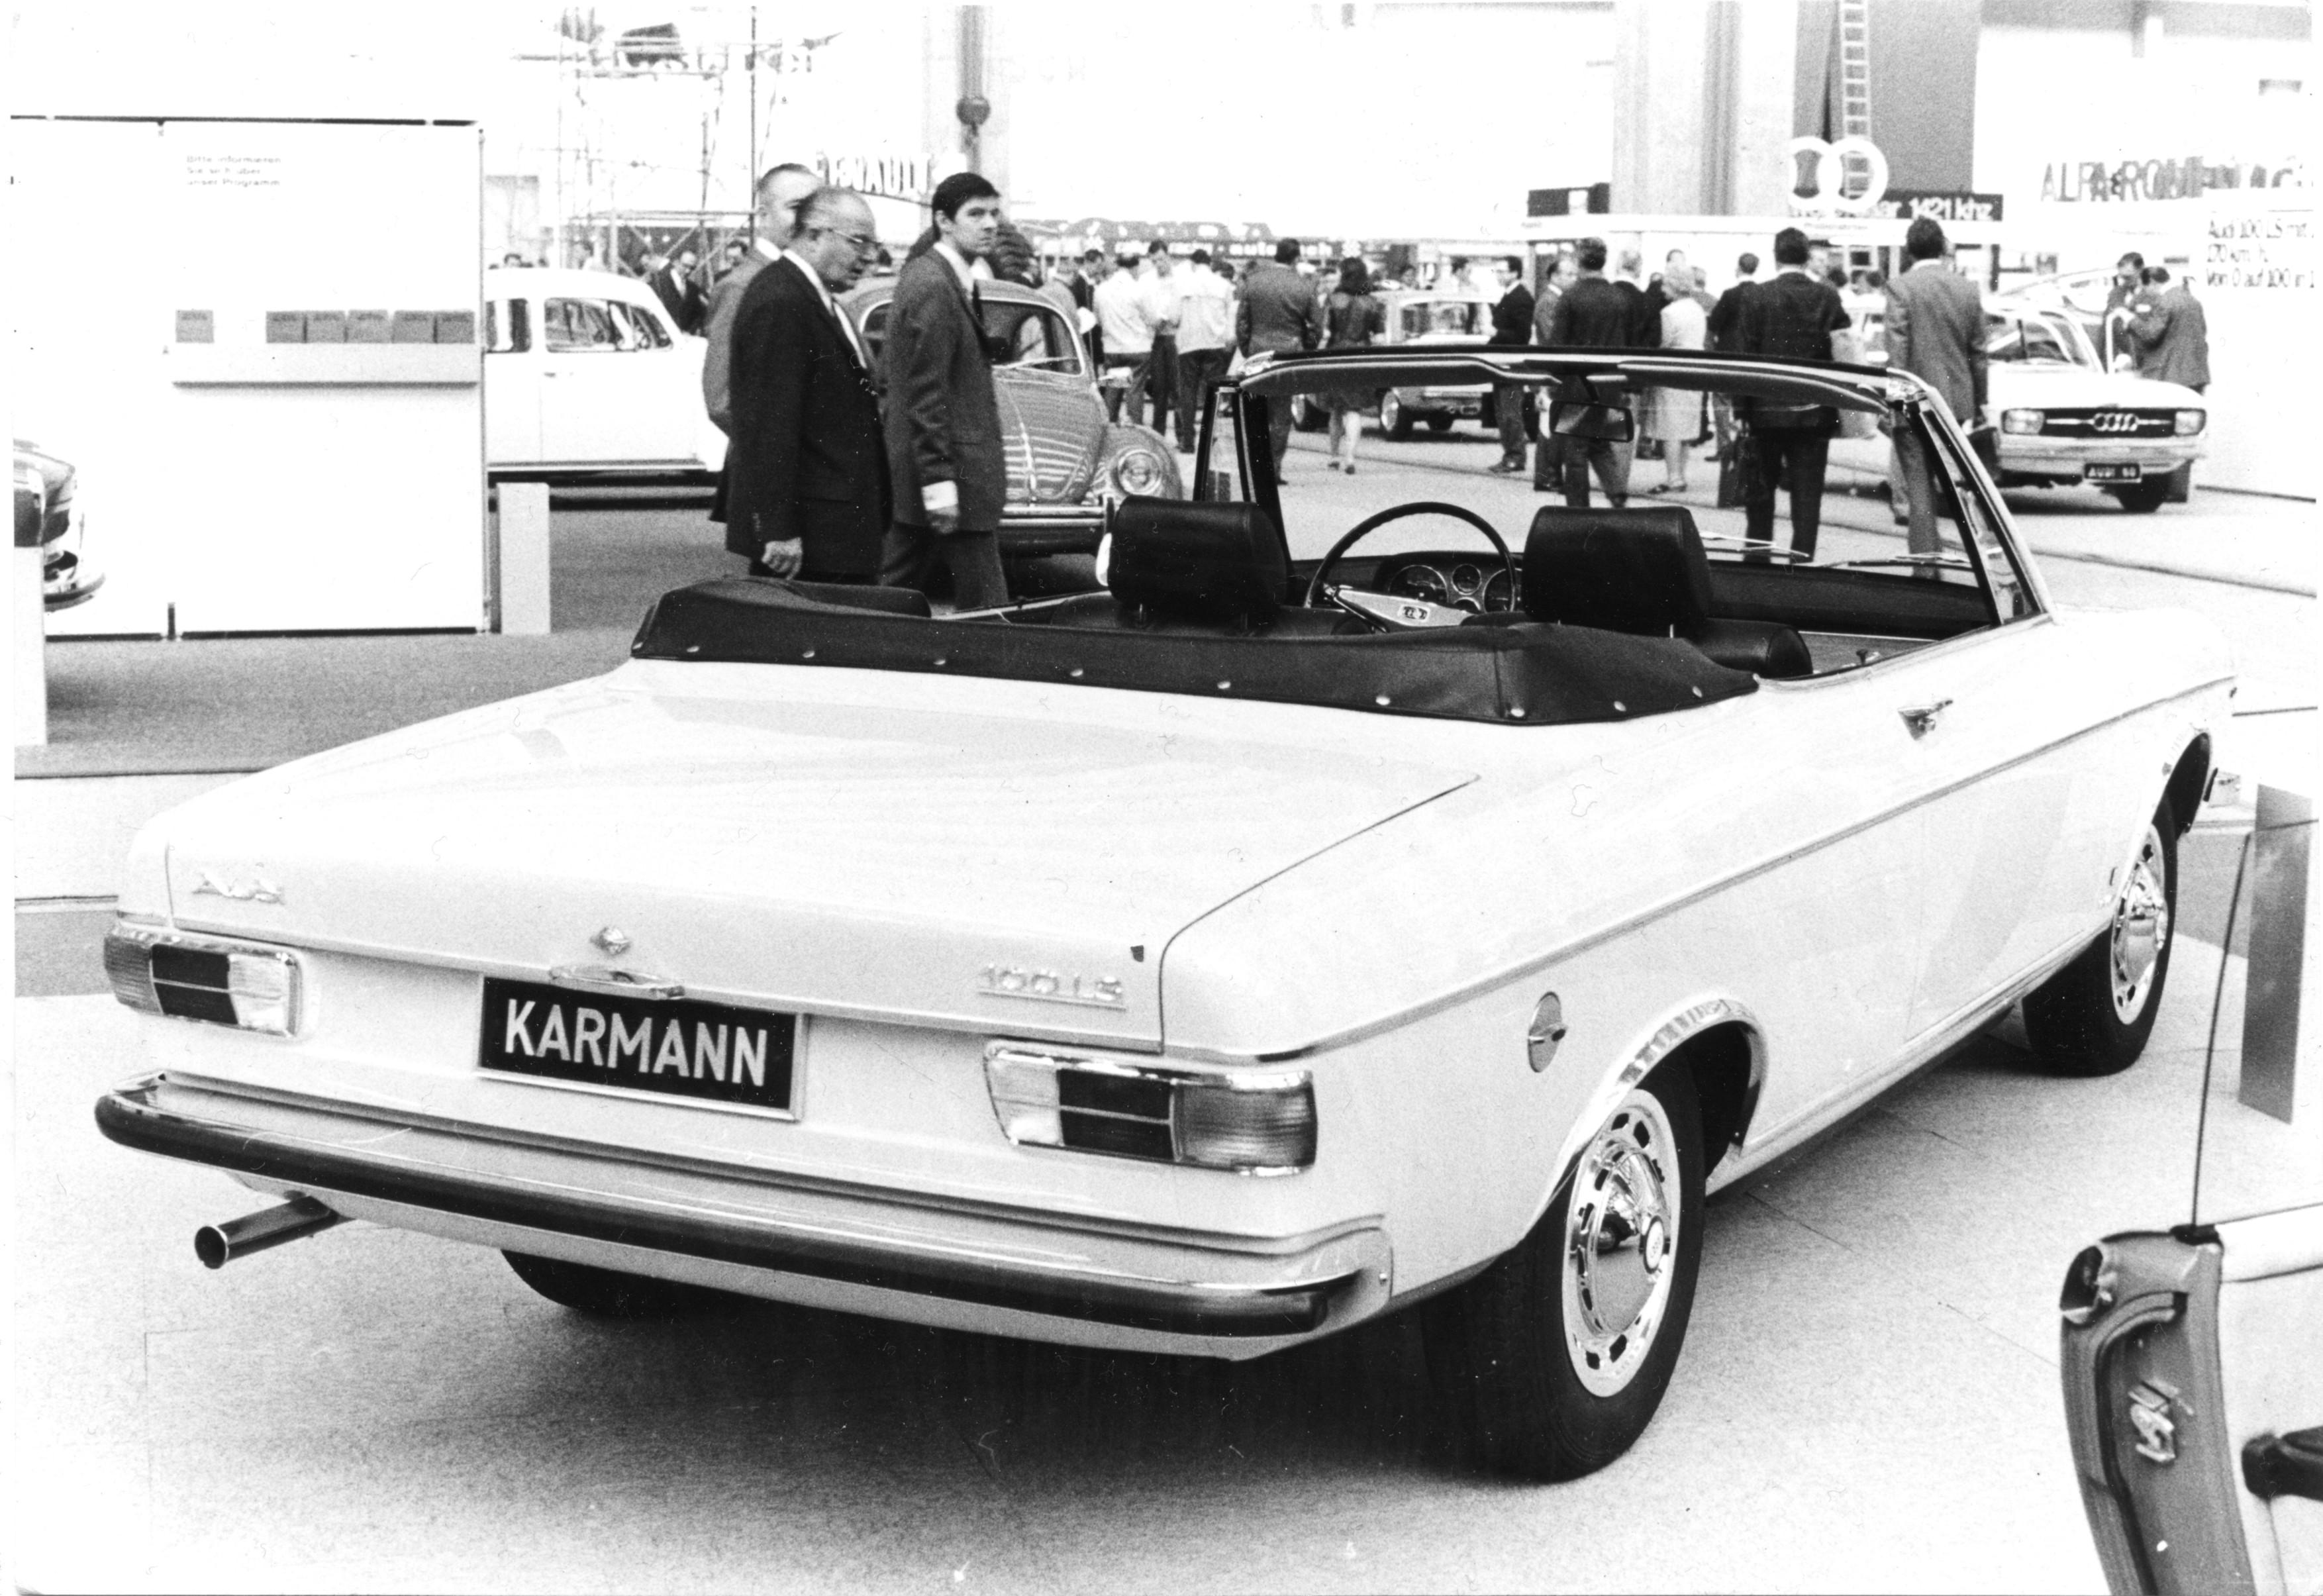 New Audi Exhibition Celebrates 50 Year Anniversary of the Audi 100